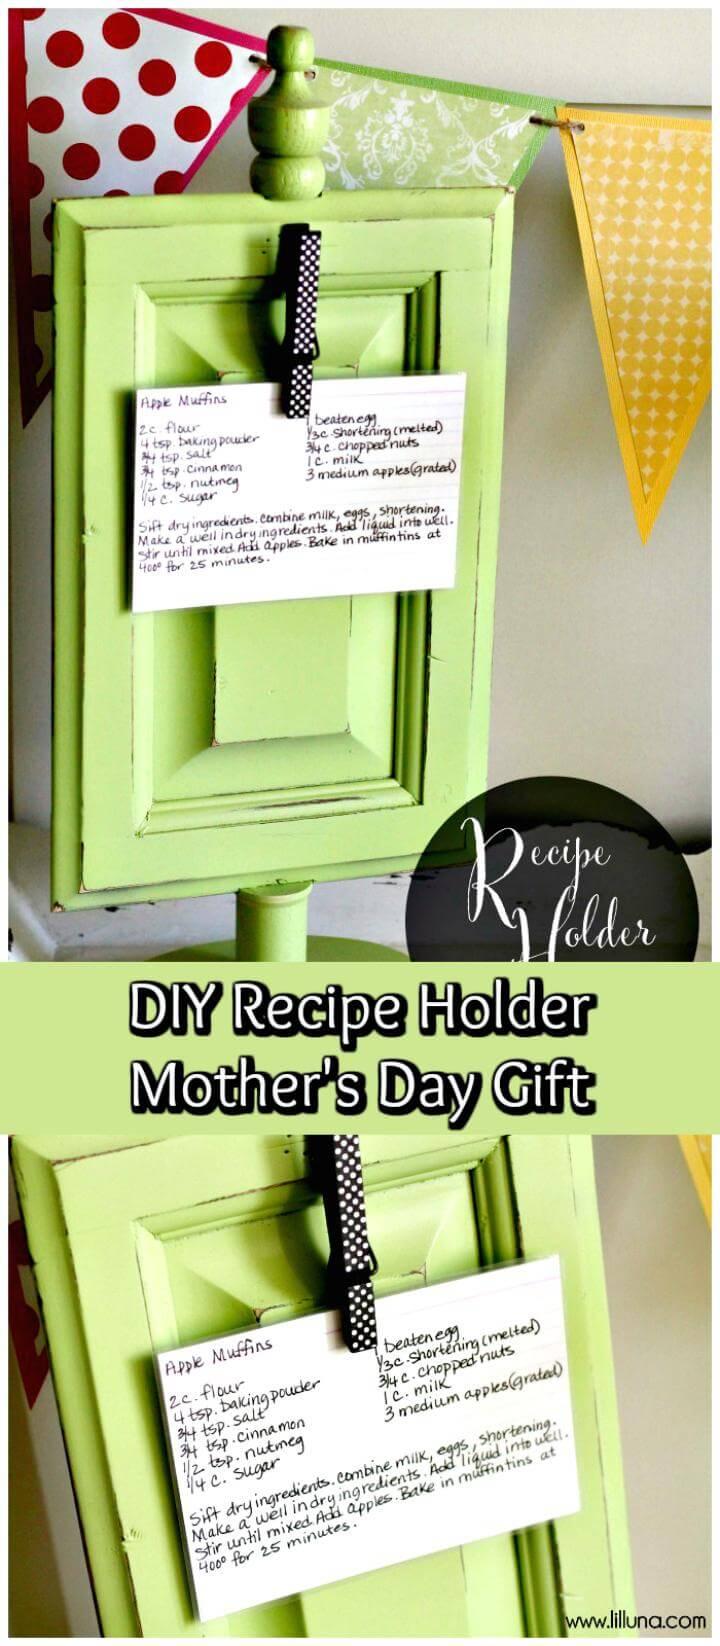 DIY recipe holder Mother's Day gift